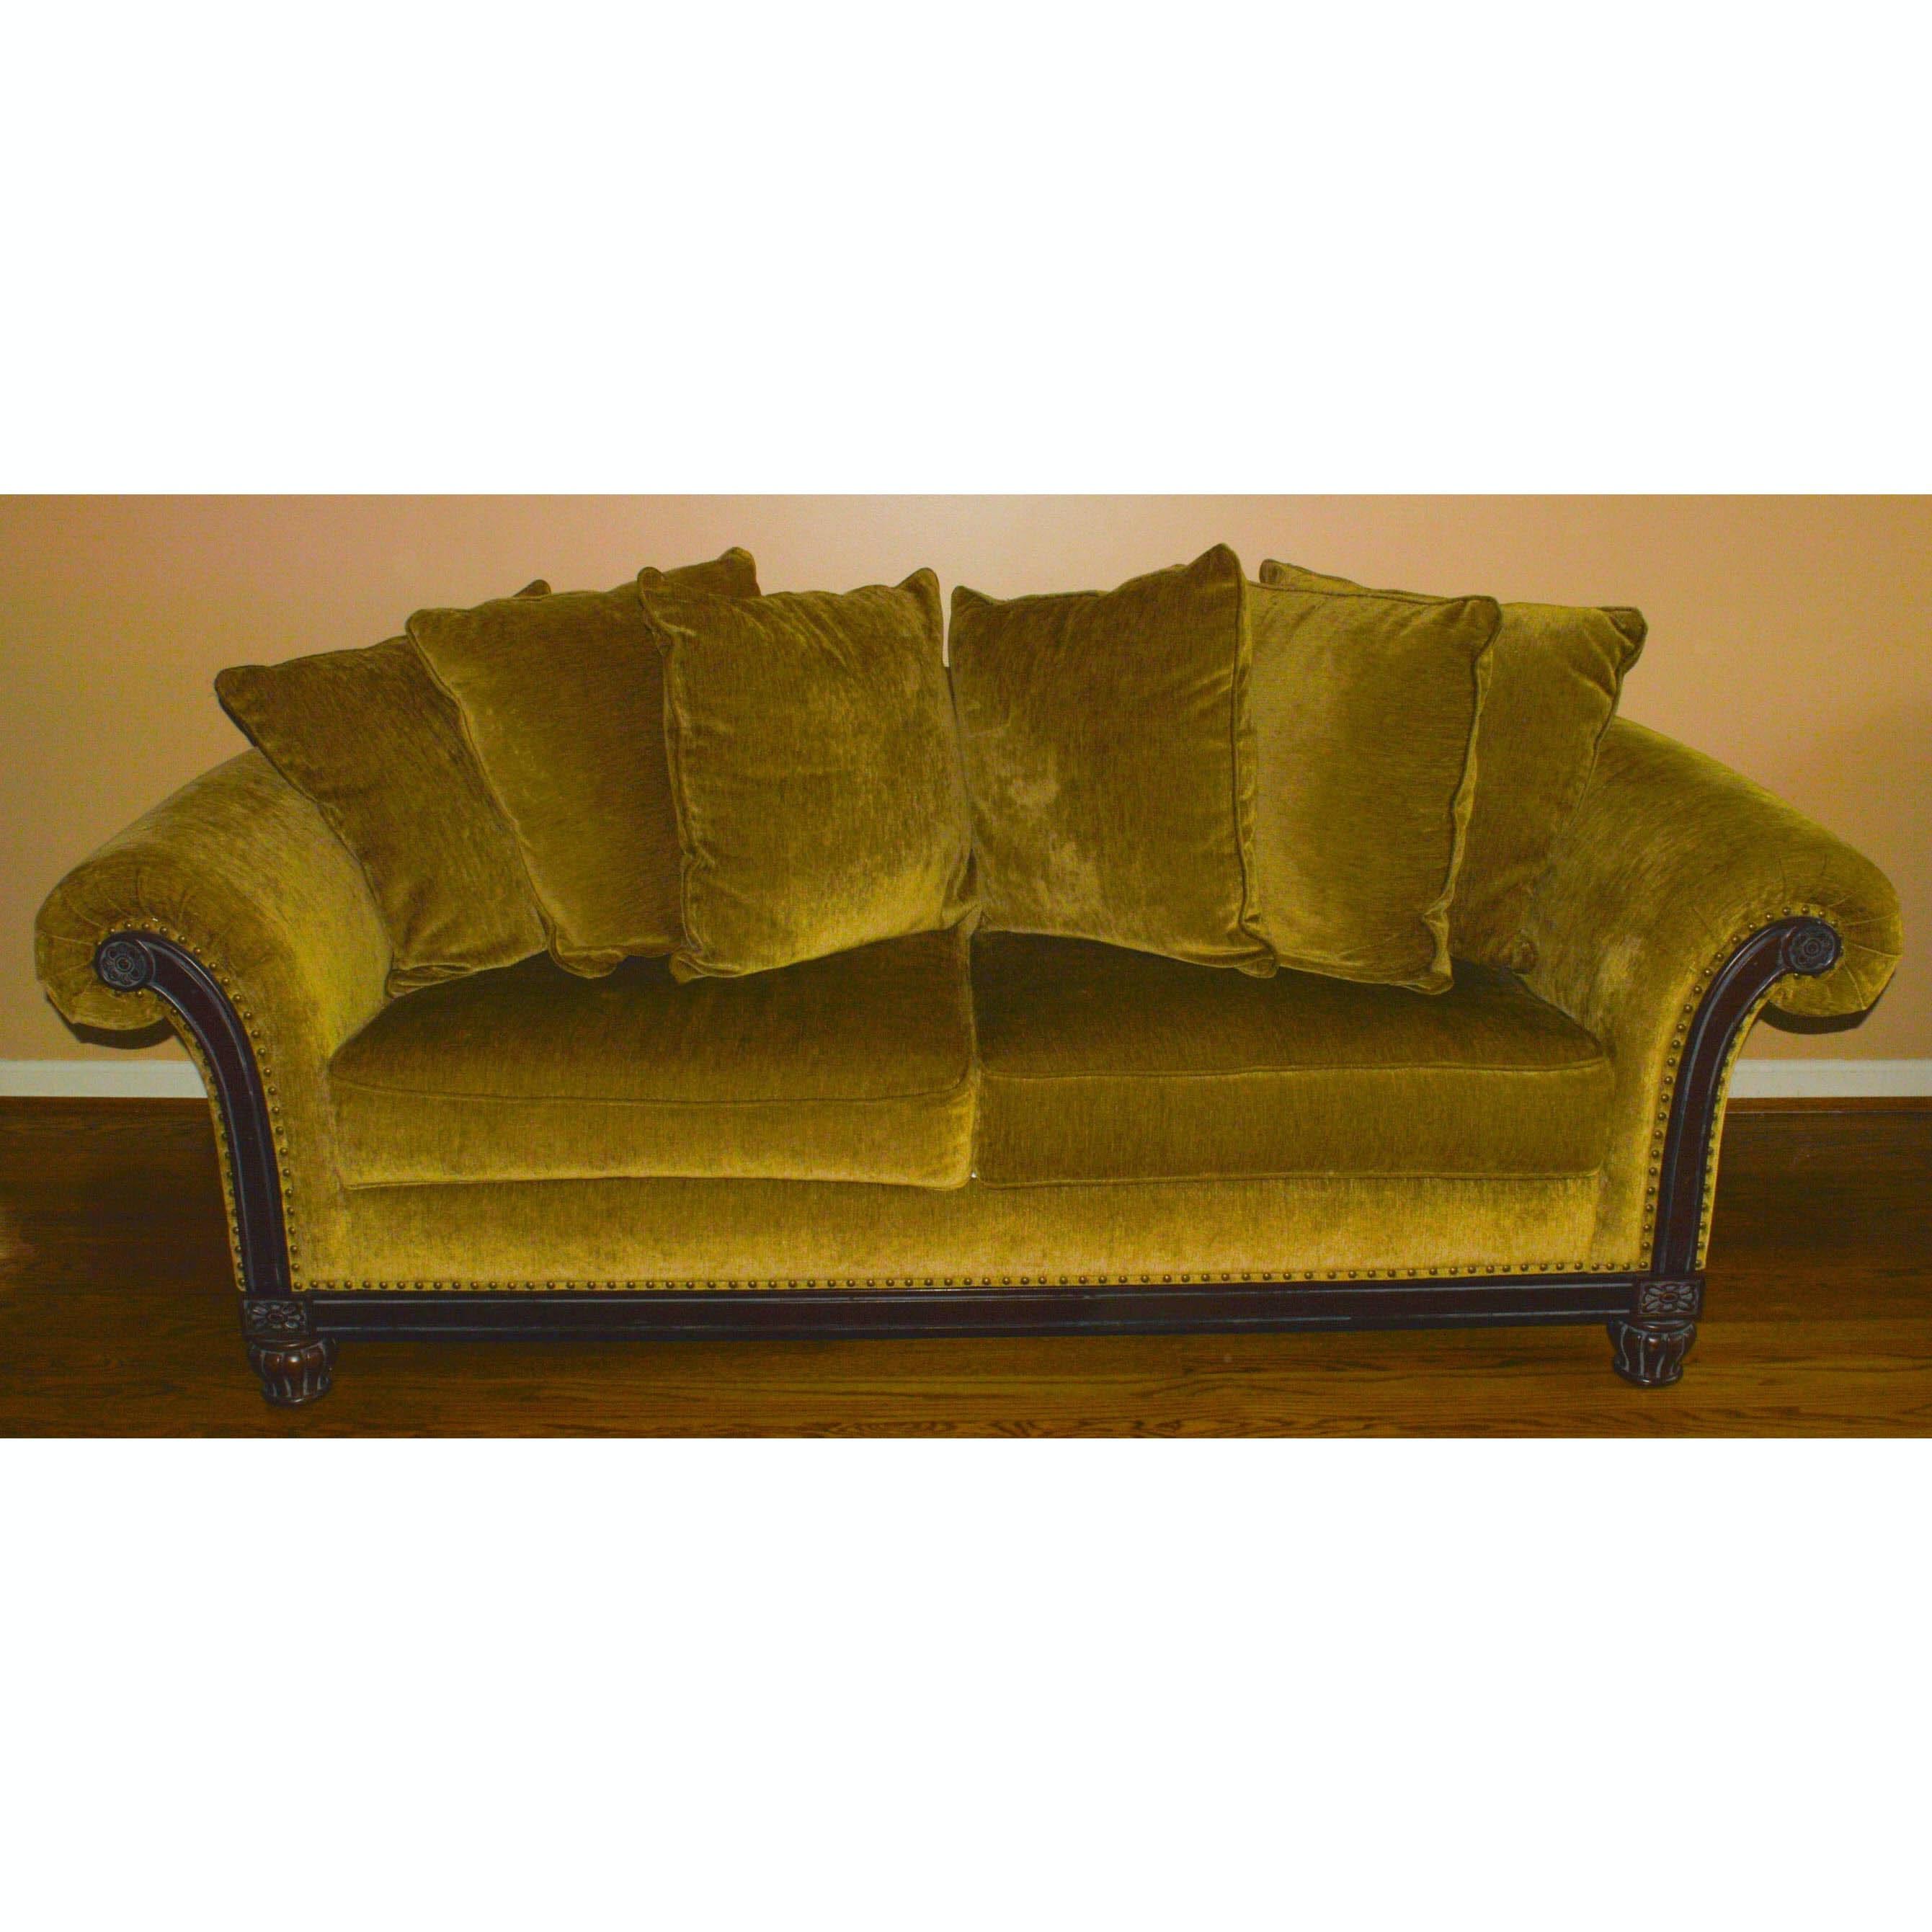 Bernhardt Furniture For Z Gallerie Sofa EBTH